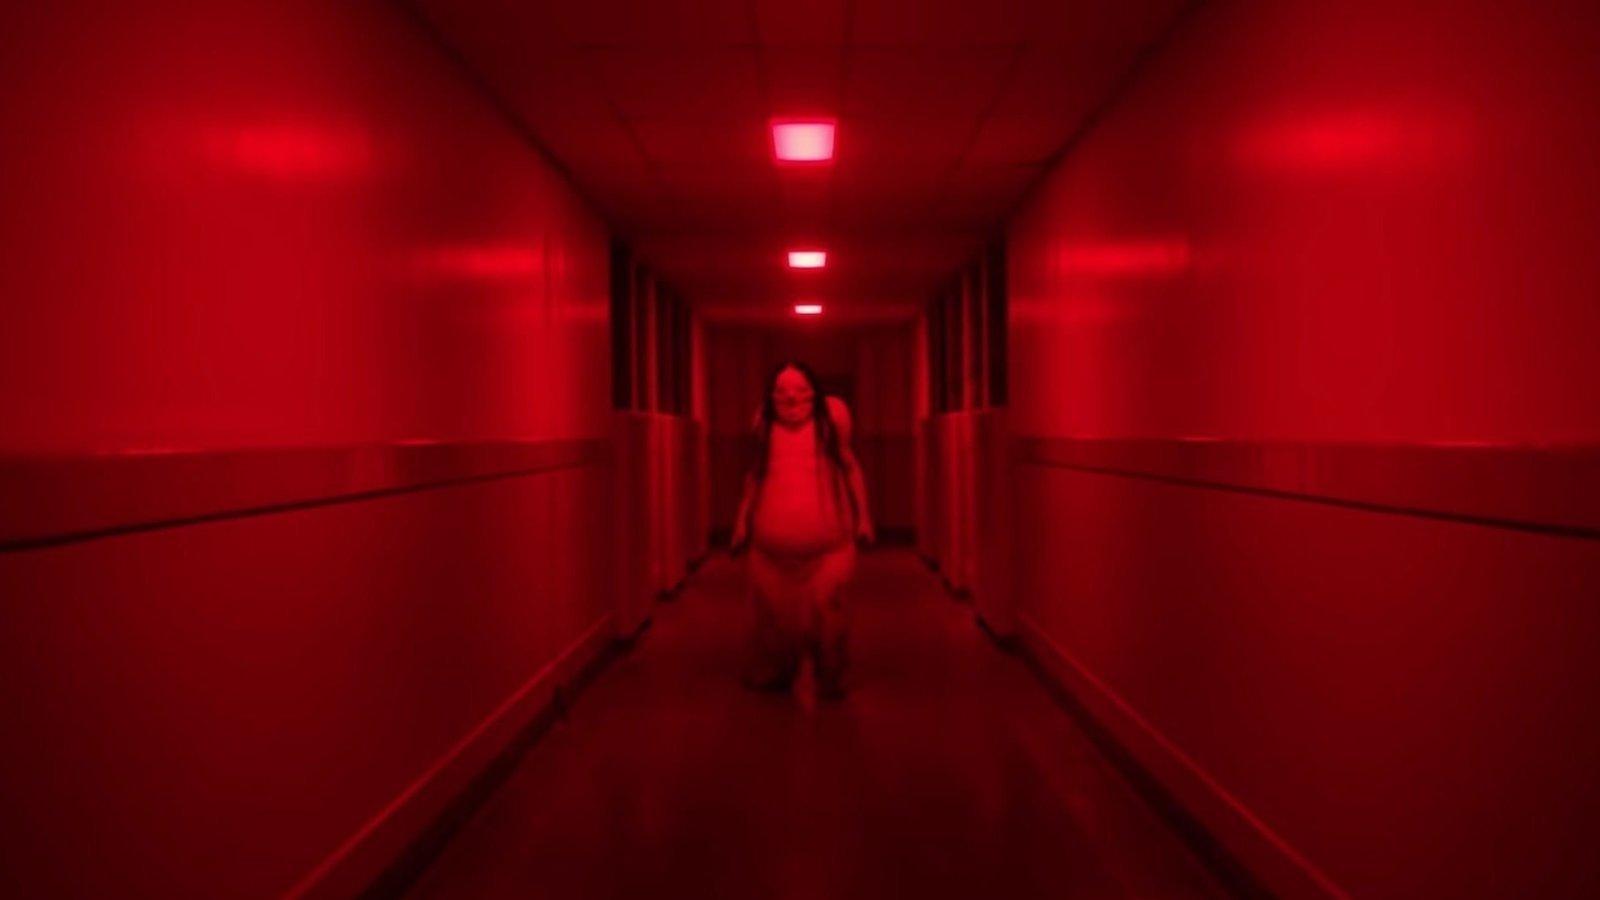 Petisi · 在黑暗中講述的恐怖故事 Scary Stories to Tell in the Dark 2019 完整版 | 免費在線看電影完整版 · Change.org